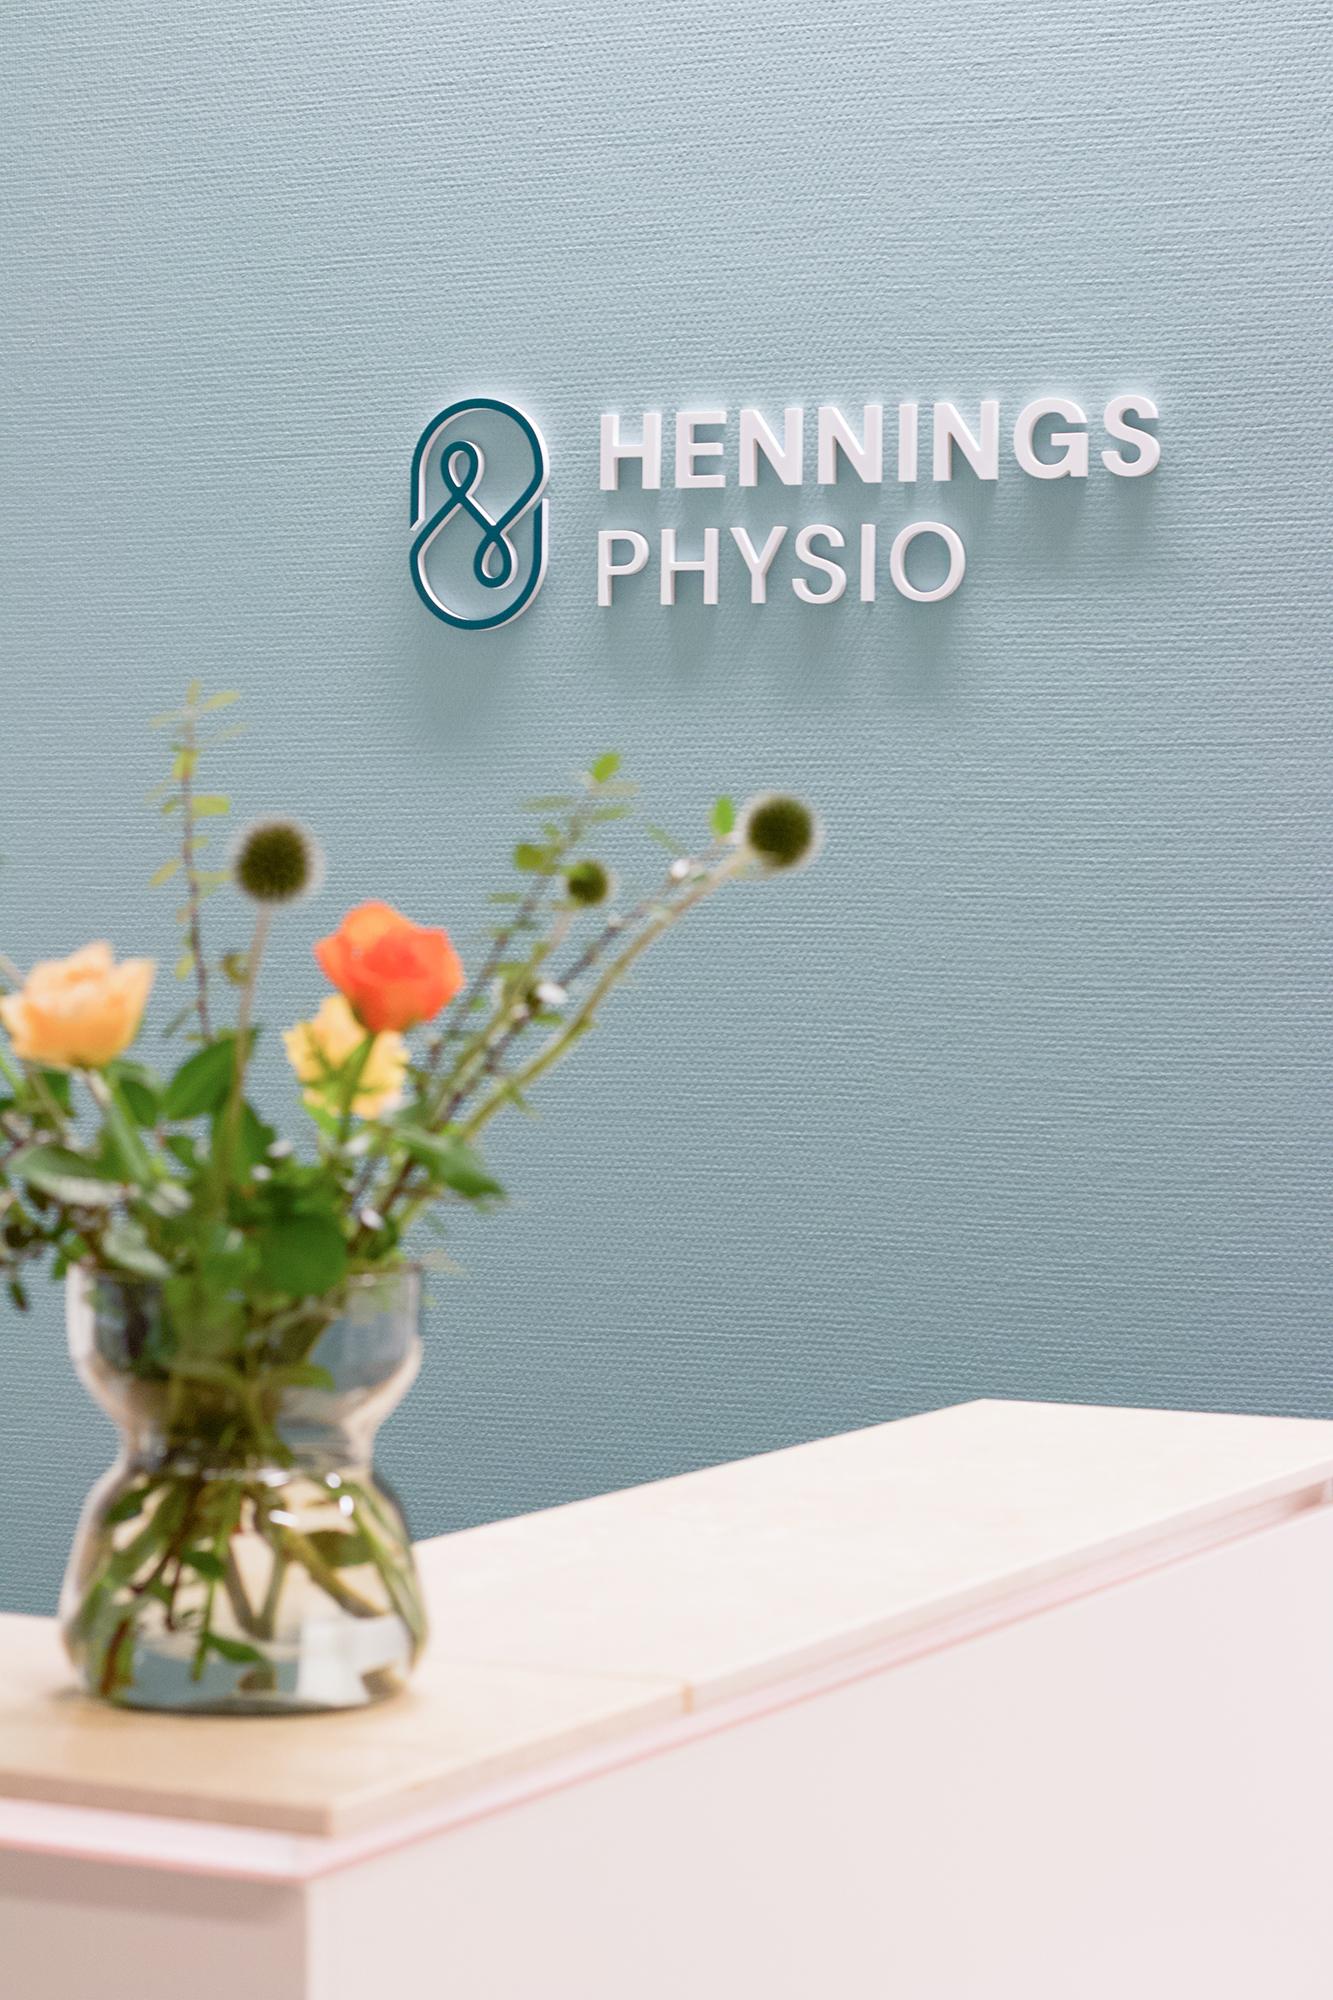 Hennings-Physio-Firmenlogo-Studio-Fondo-1